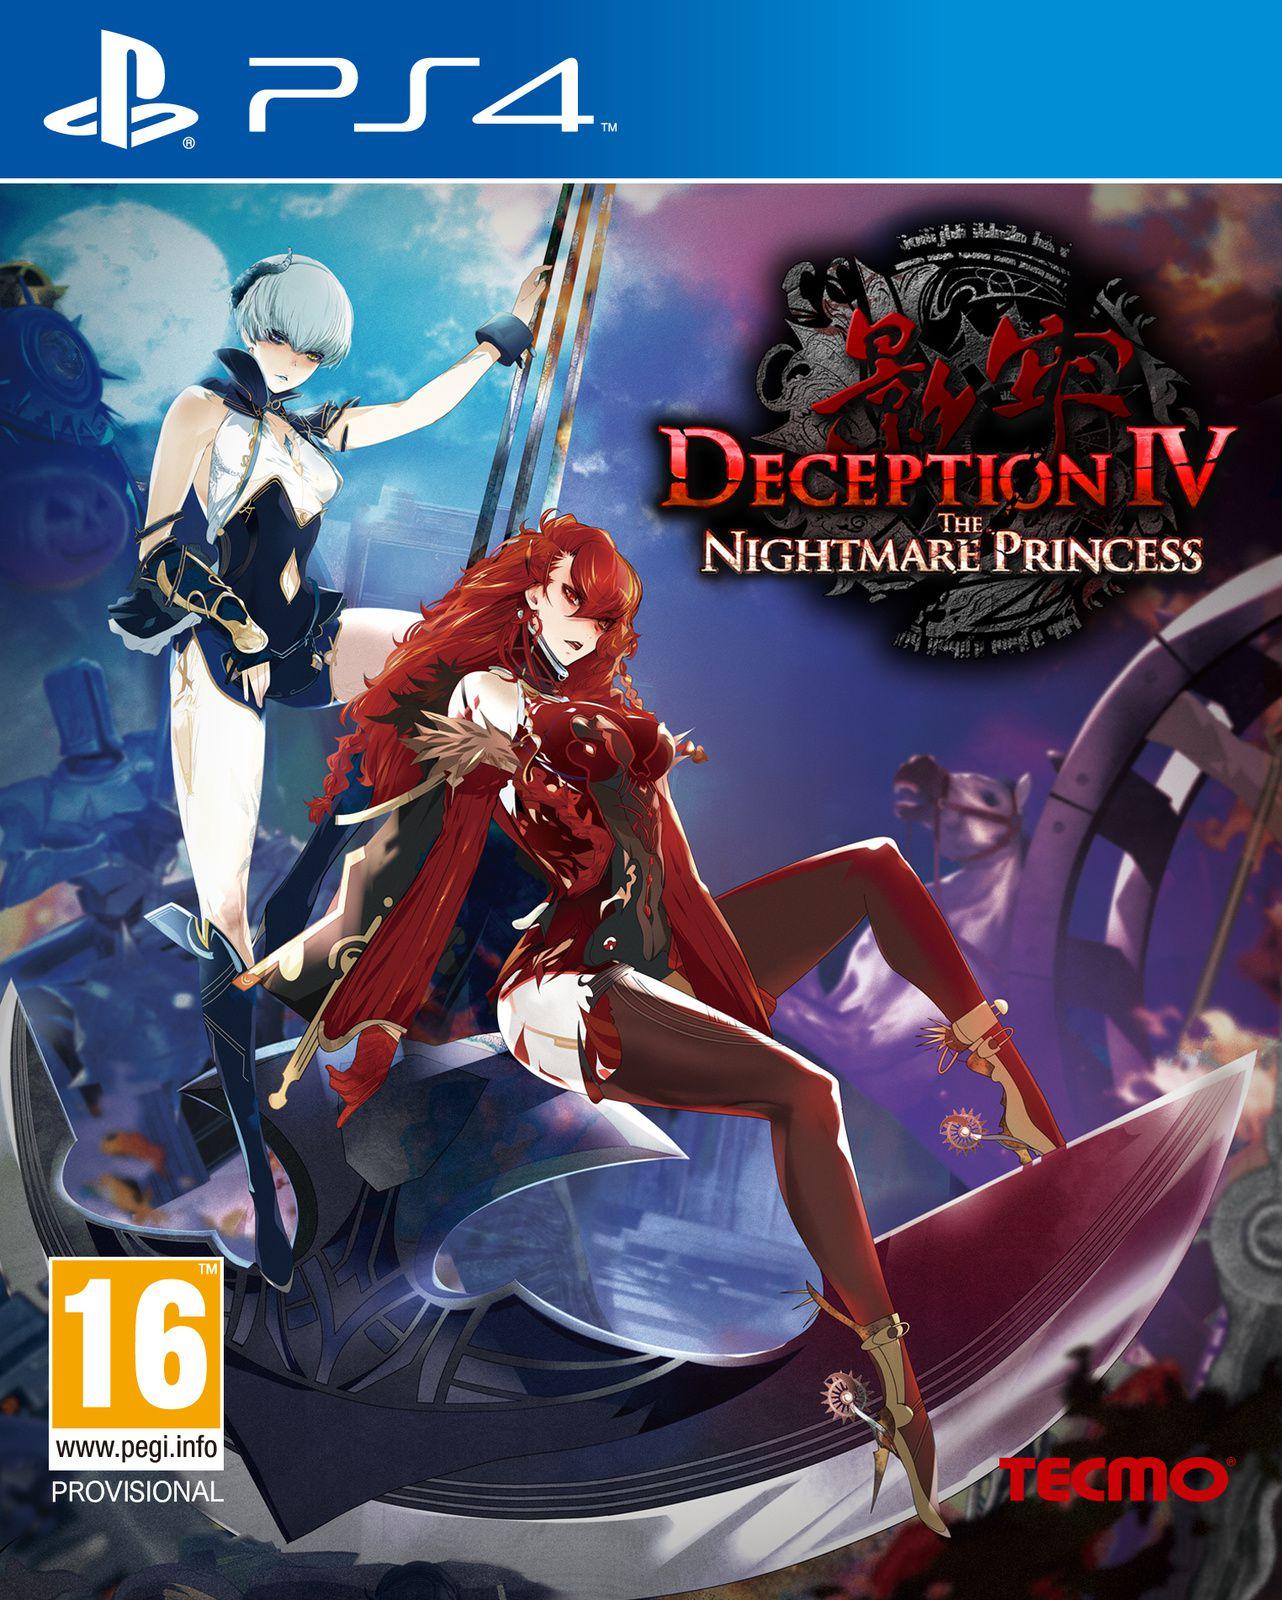 TEST de DECEPTION IV THE NIGHTMARE PRINCESS (sur PS4): attention ça va couper...